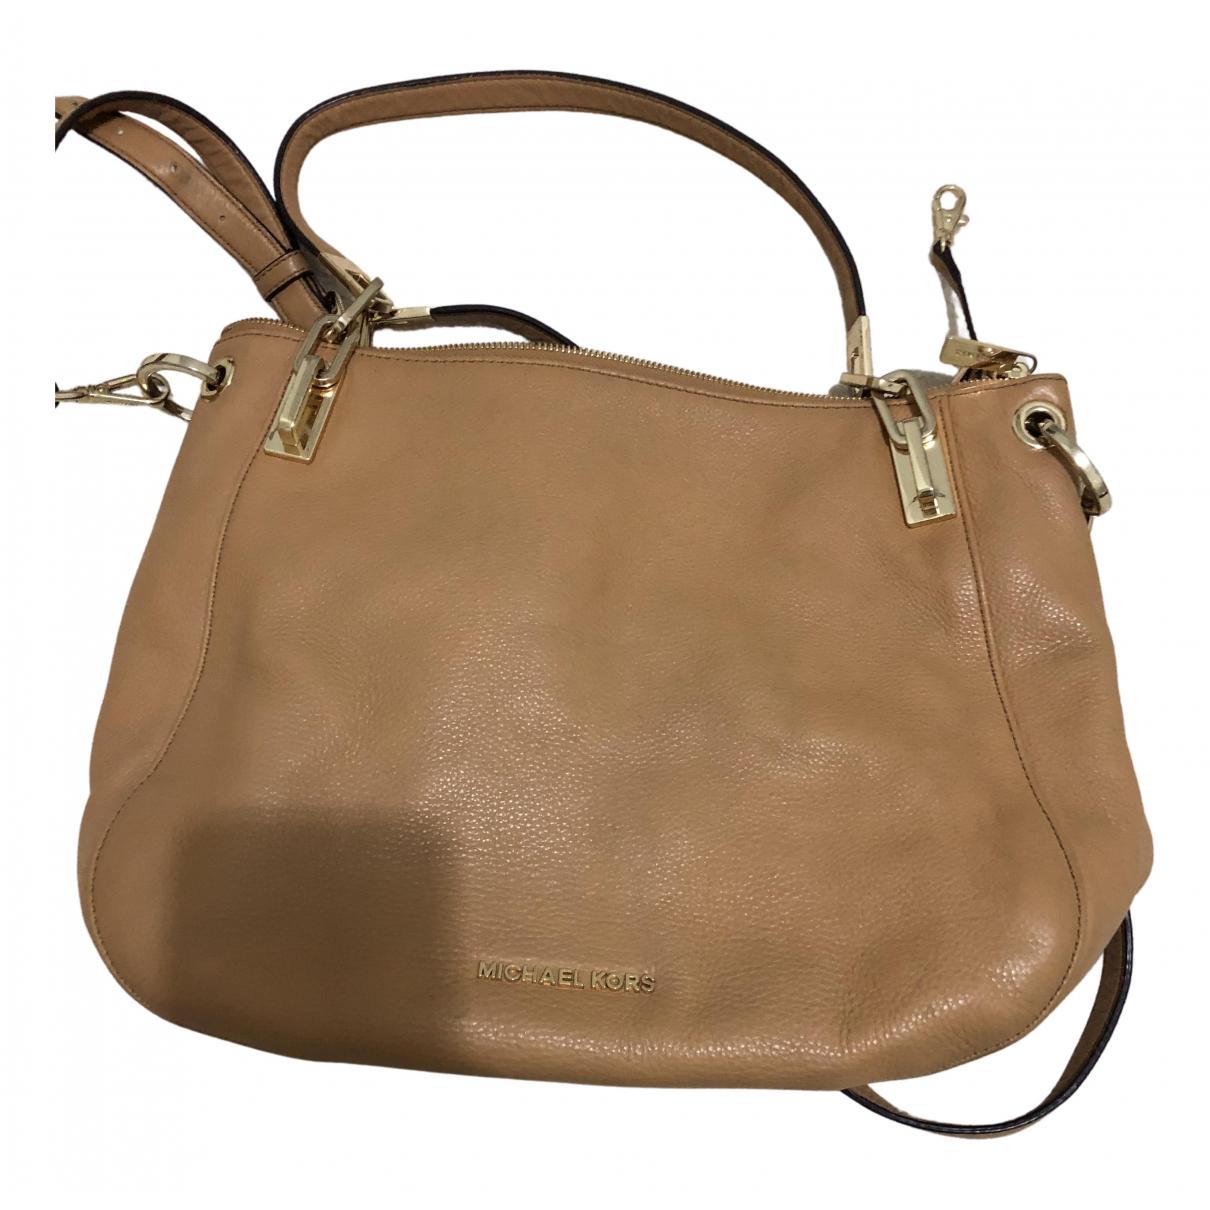 Michael Kors N Beige Leather handbag for Women N